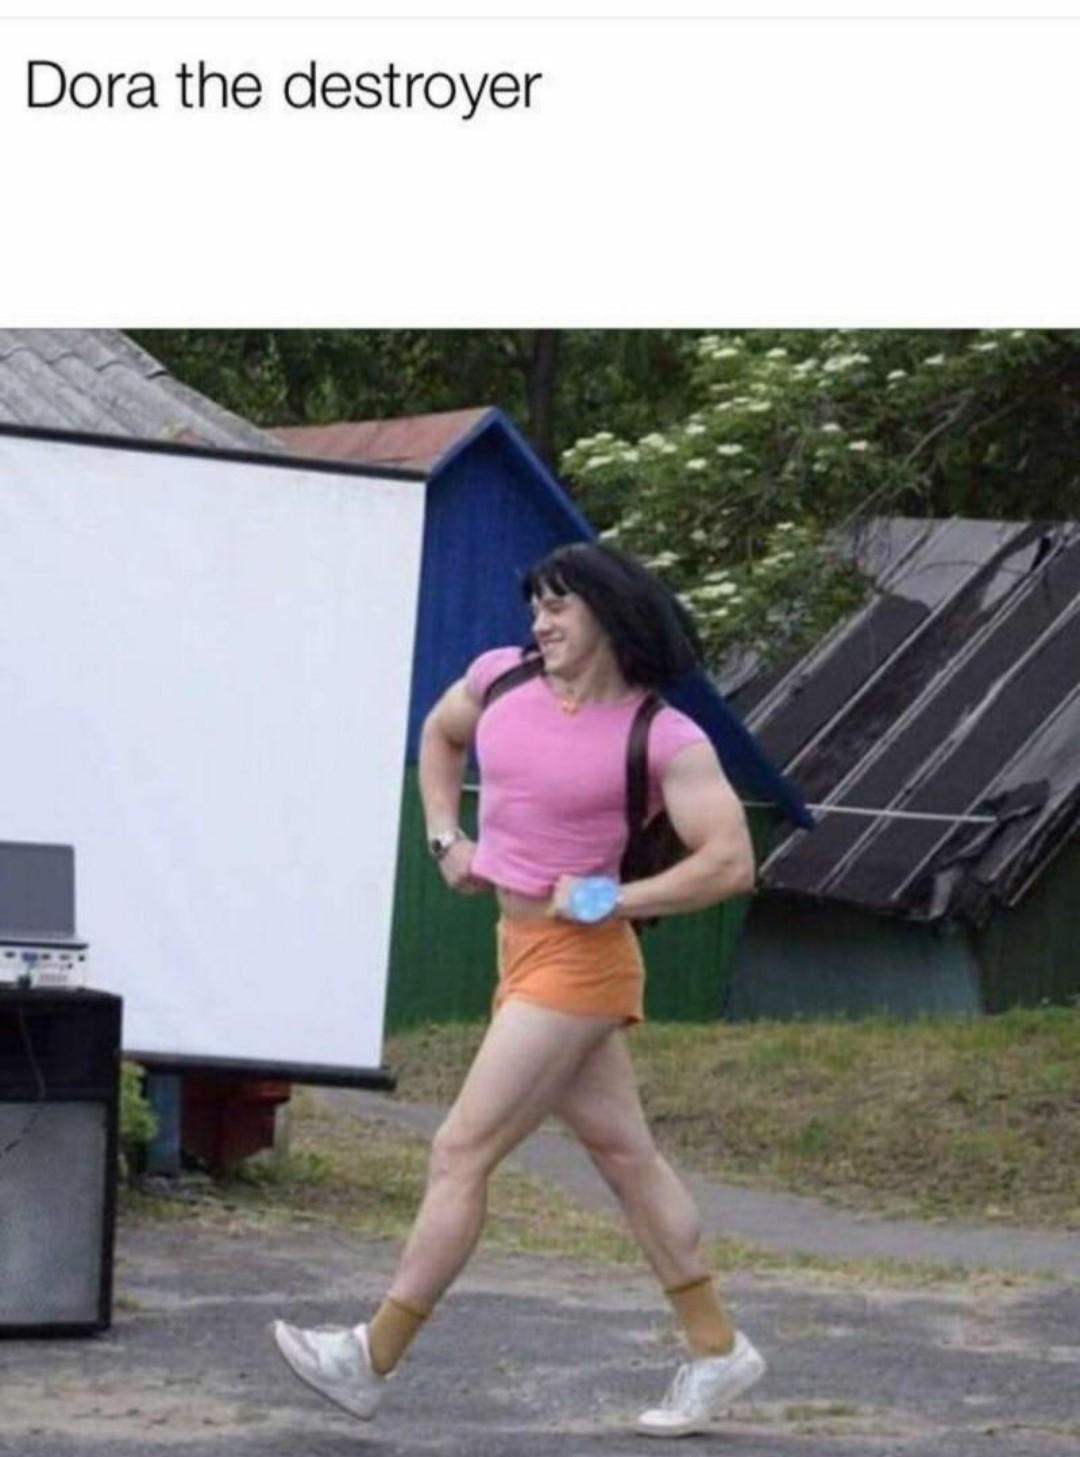 Dora the explorer - meme